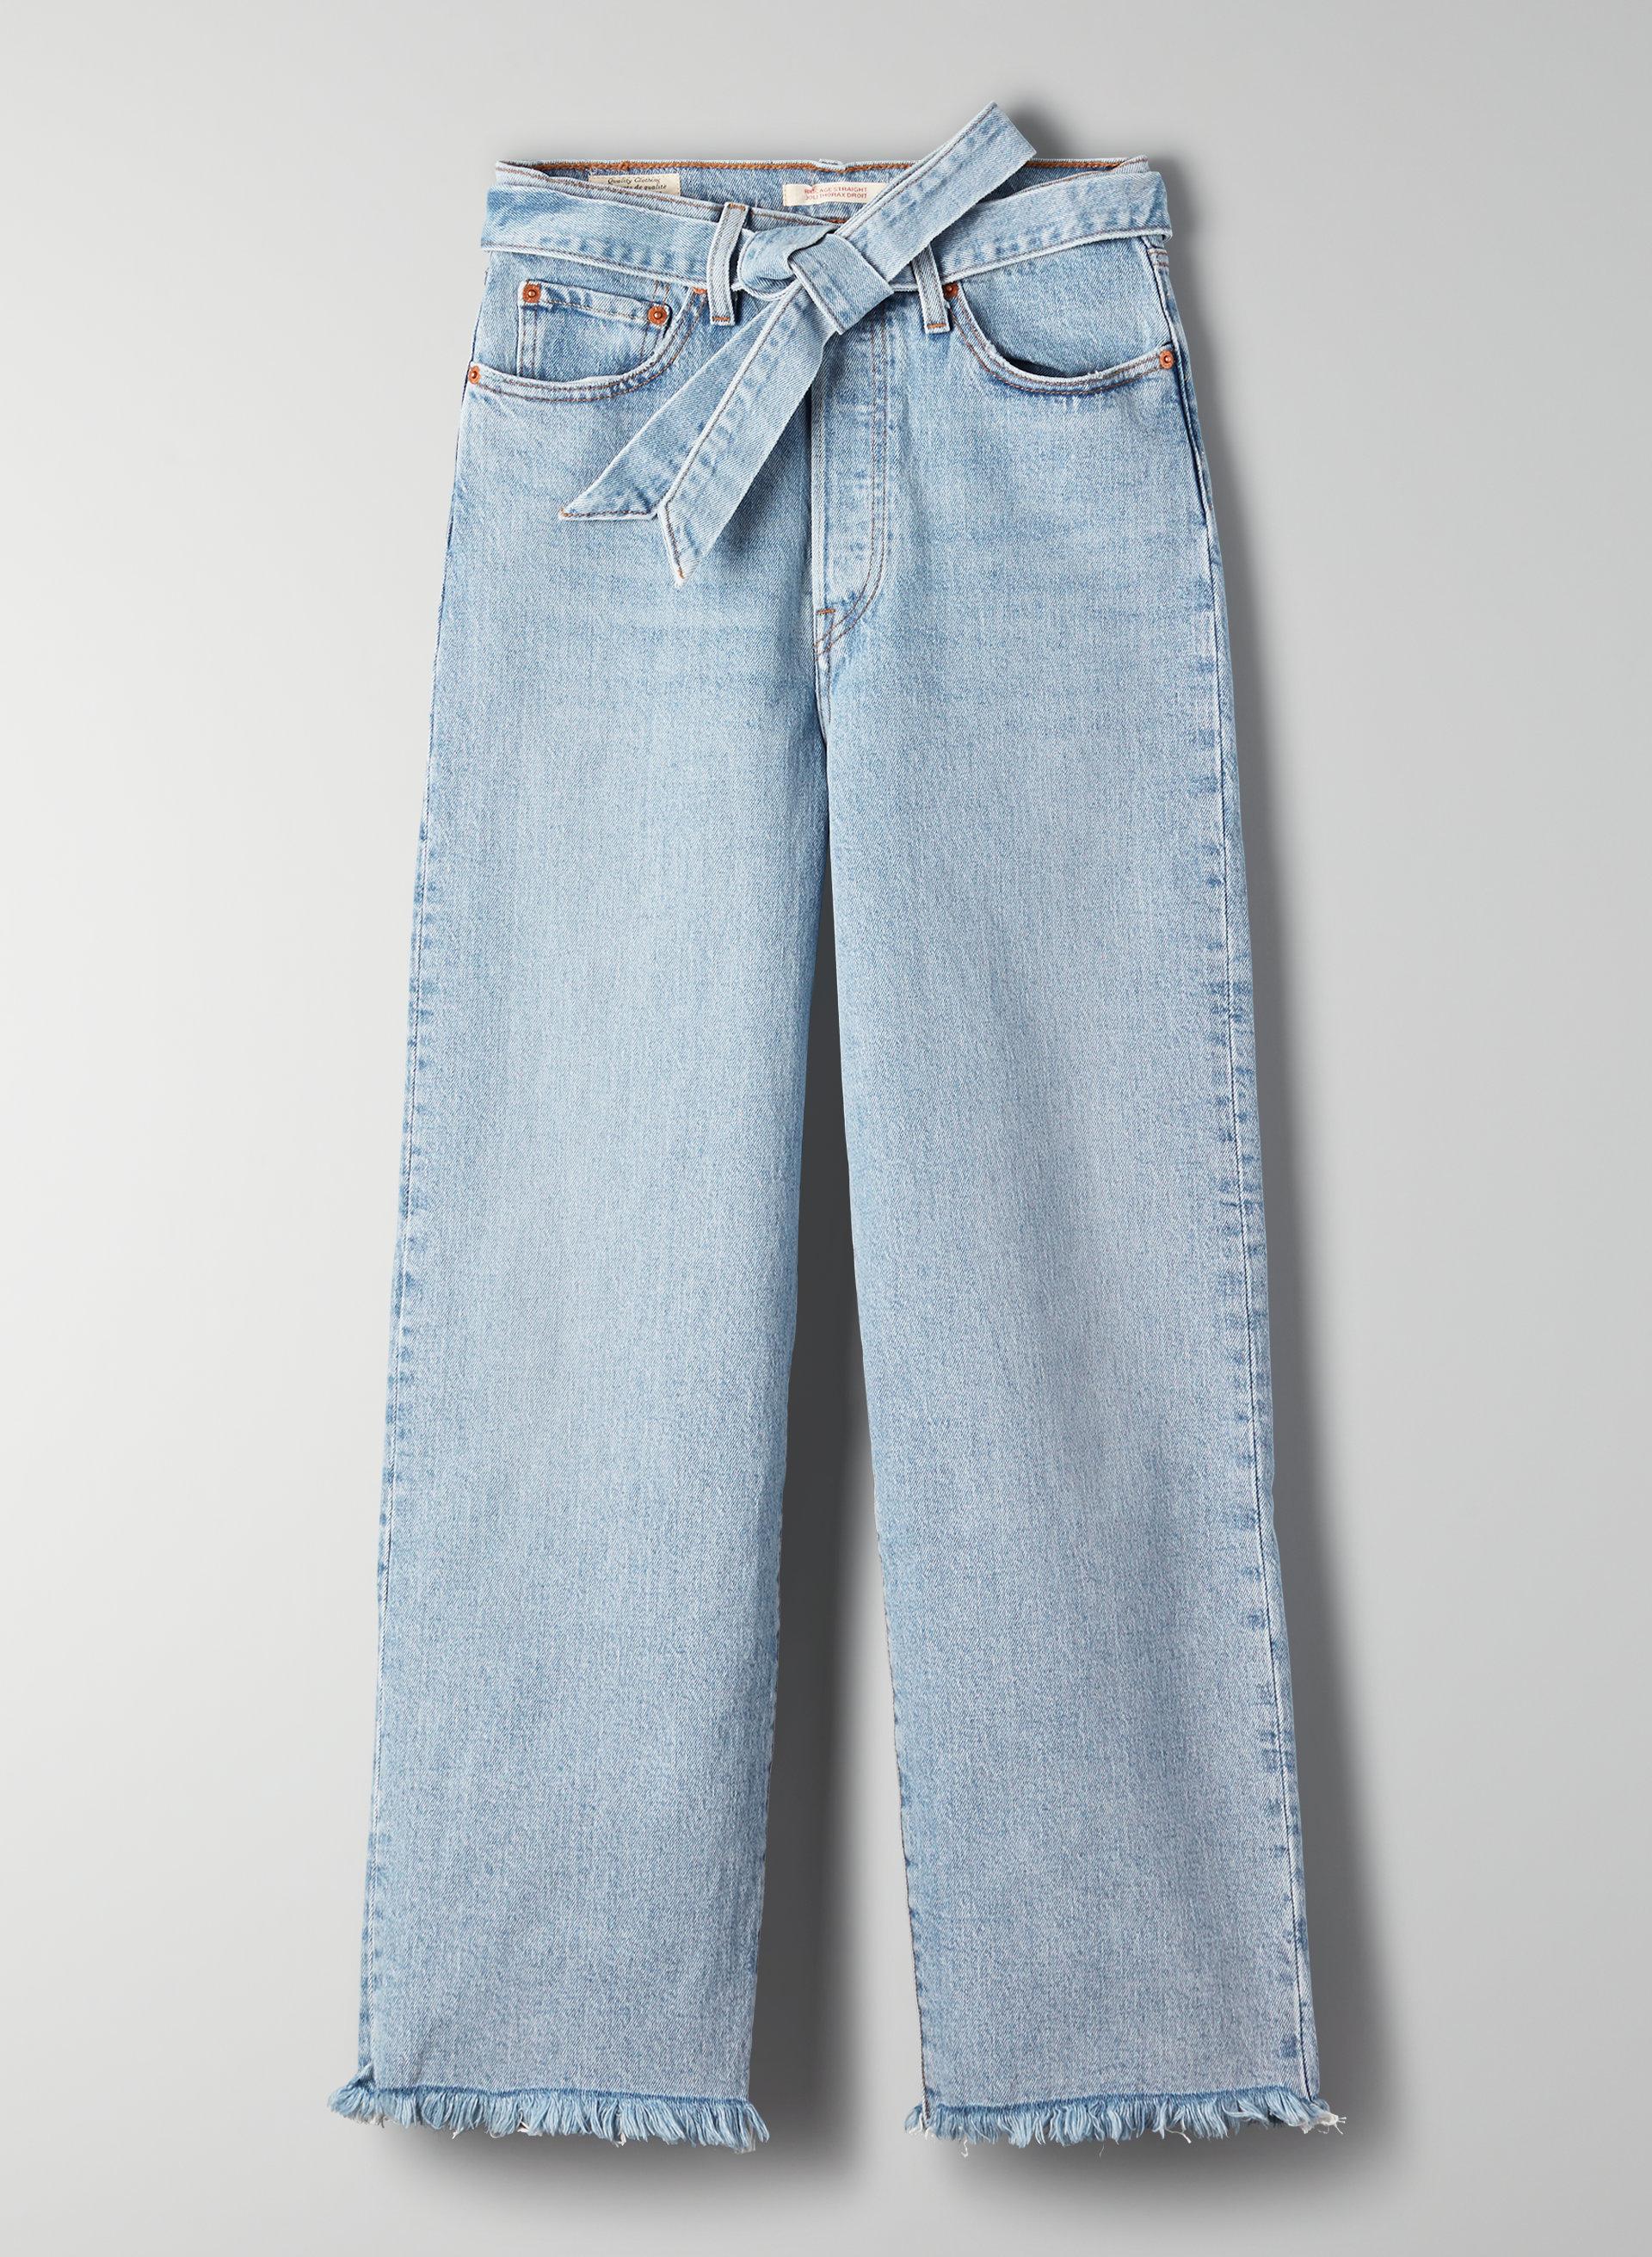 Jeans Jeans Levi's Levi's RibcageAritzia Ca RibcageAritzia RibcageAritzia Jeans RibcageAritzia Ca Ca Jeans Levi's Levi's 6bfg7y